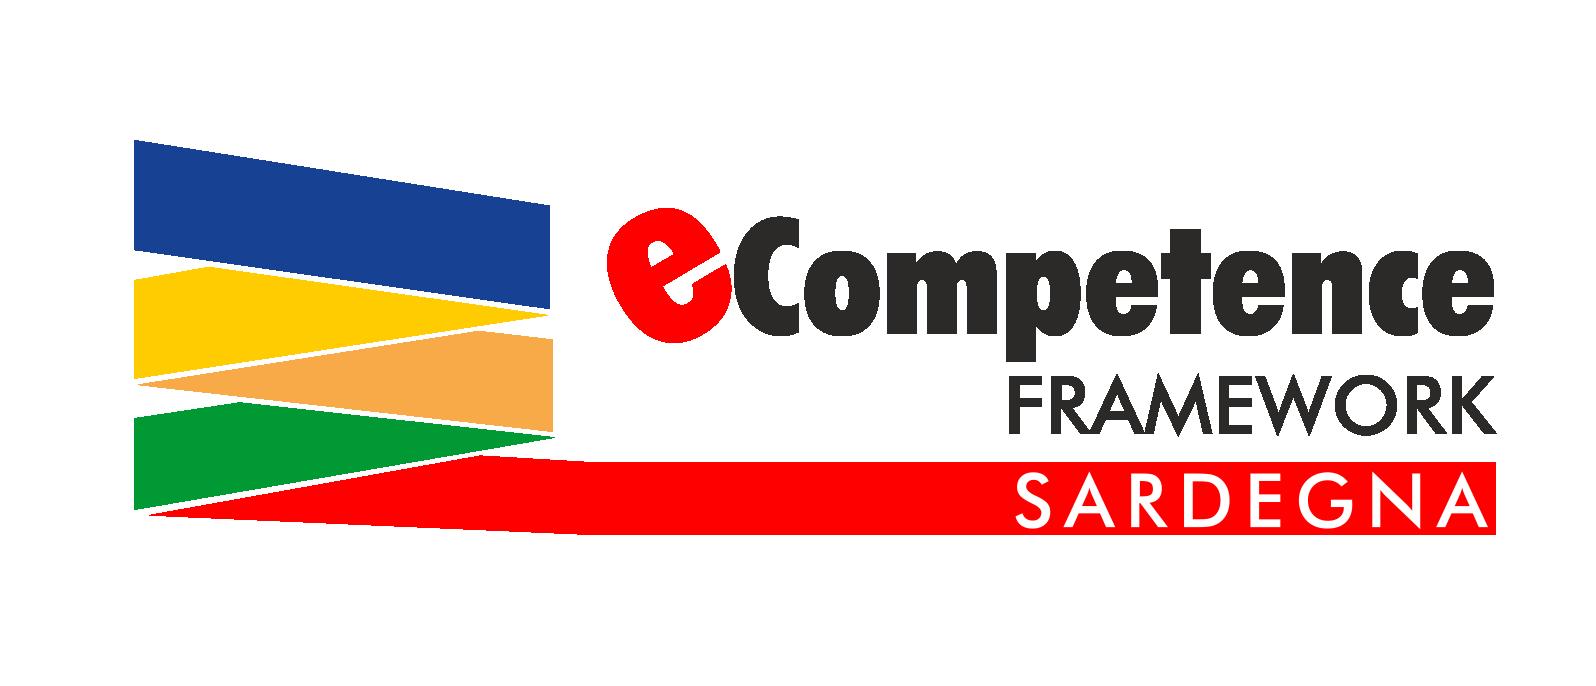 e-competence framework